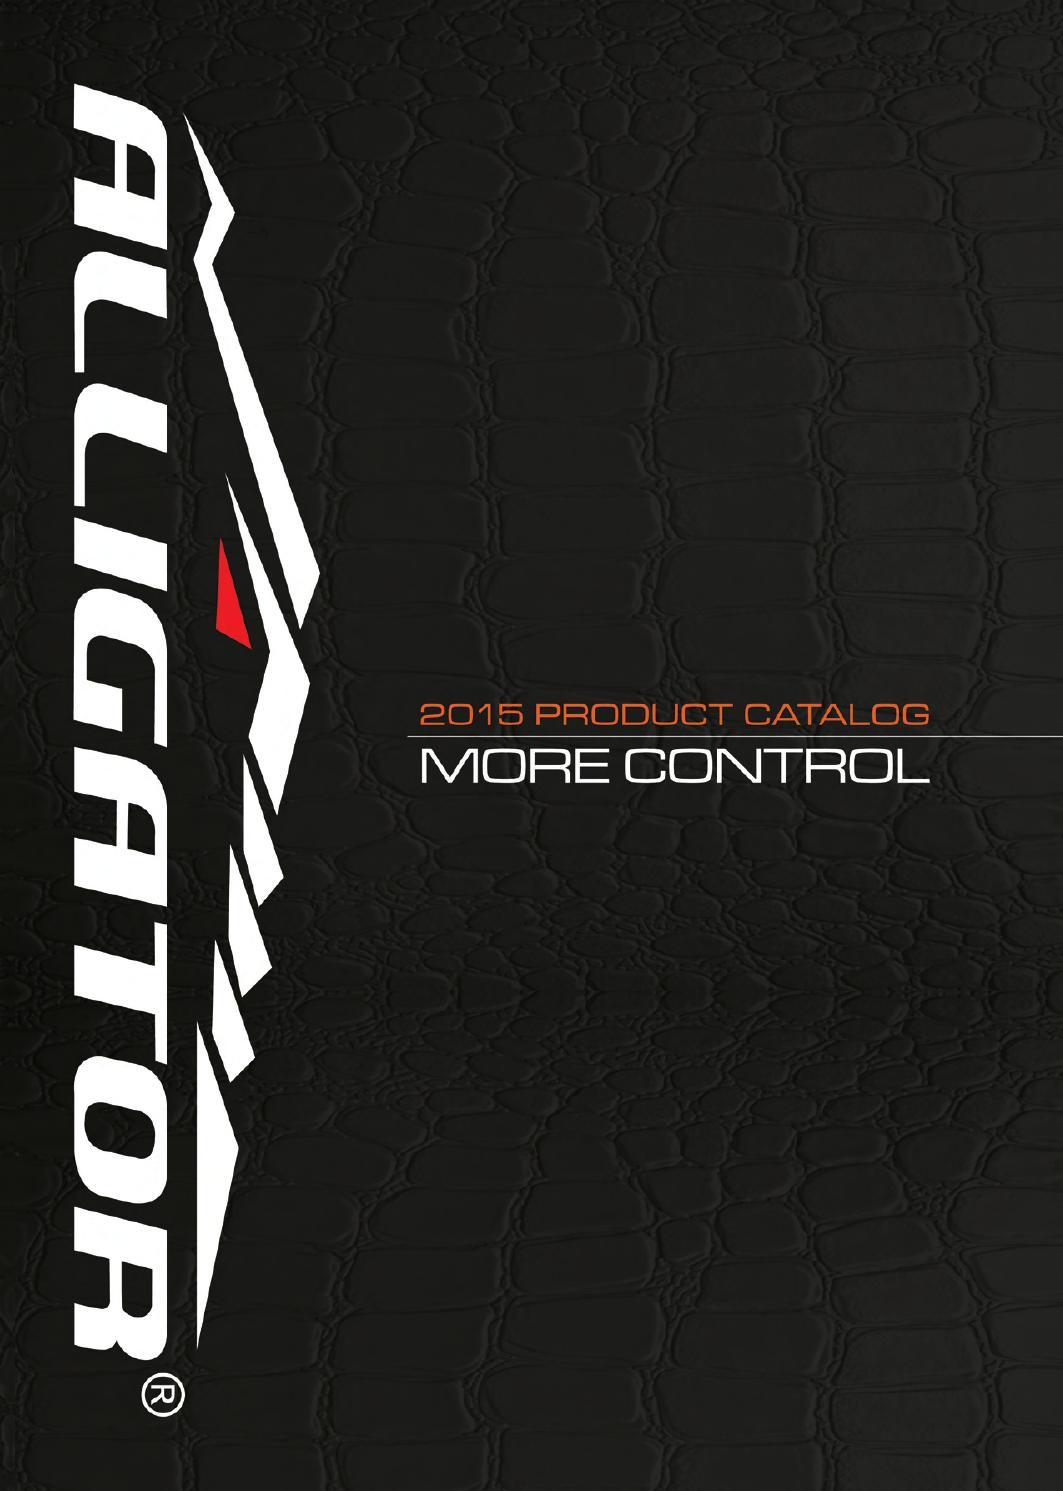 Alligator Braided Brake Cable Kit Slick Front Rear MTB Road Shimano SRAM Campy